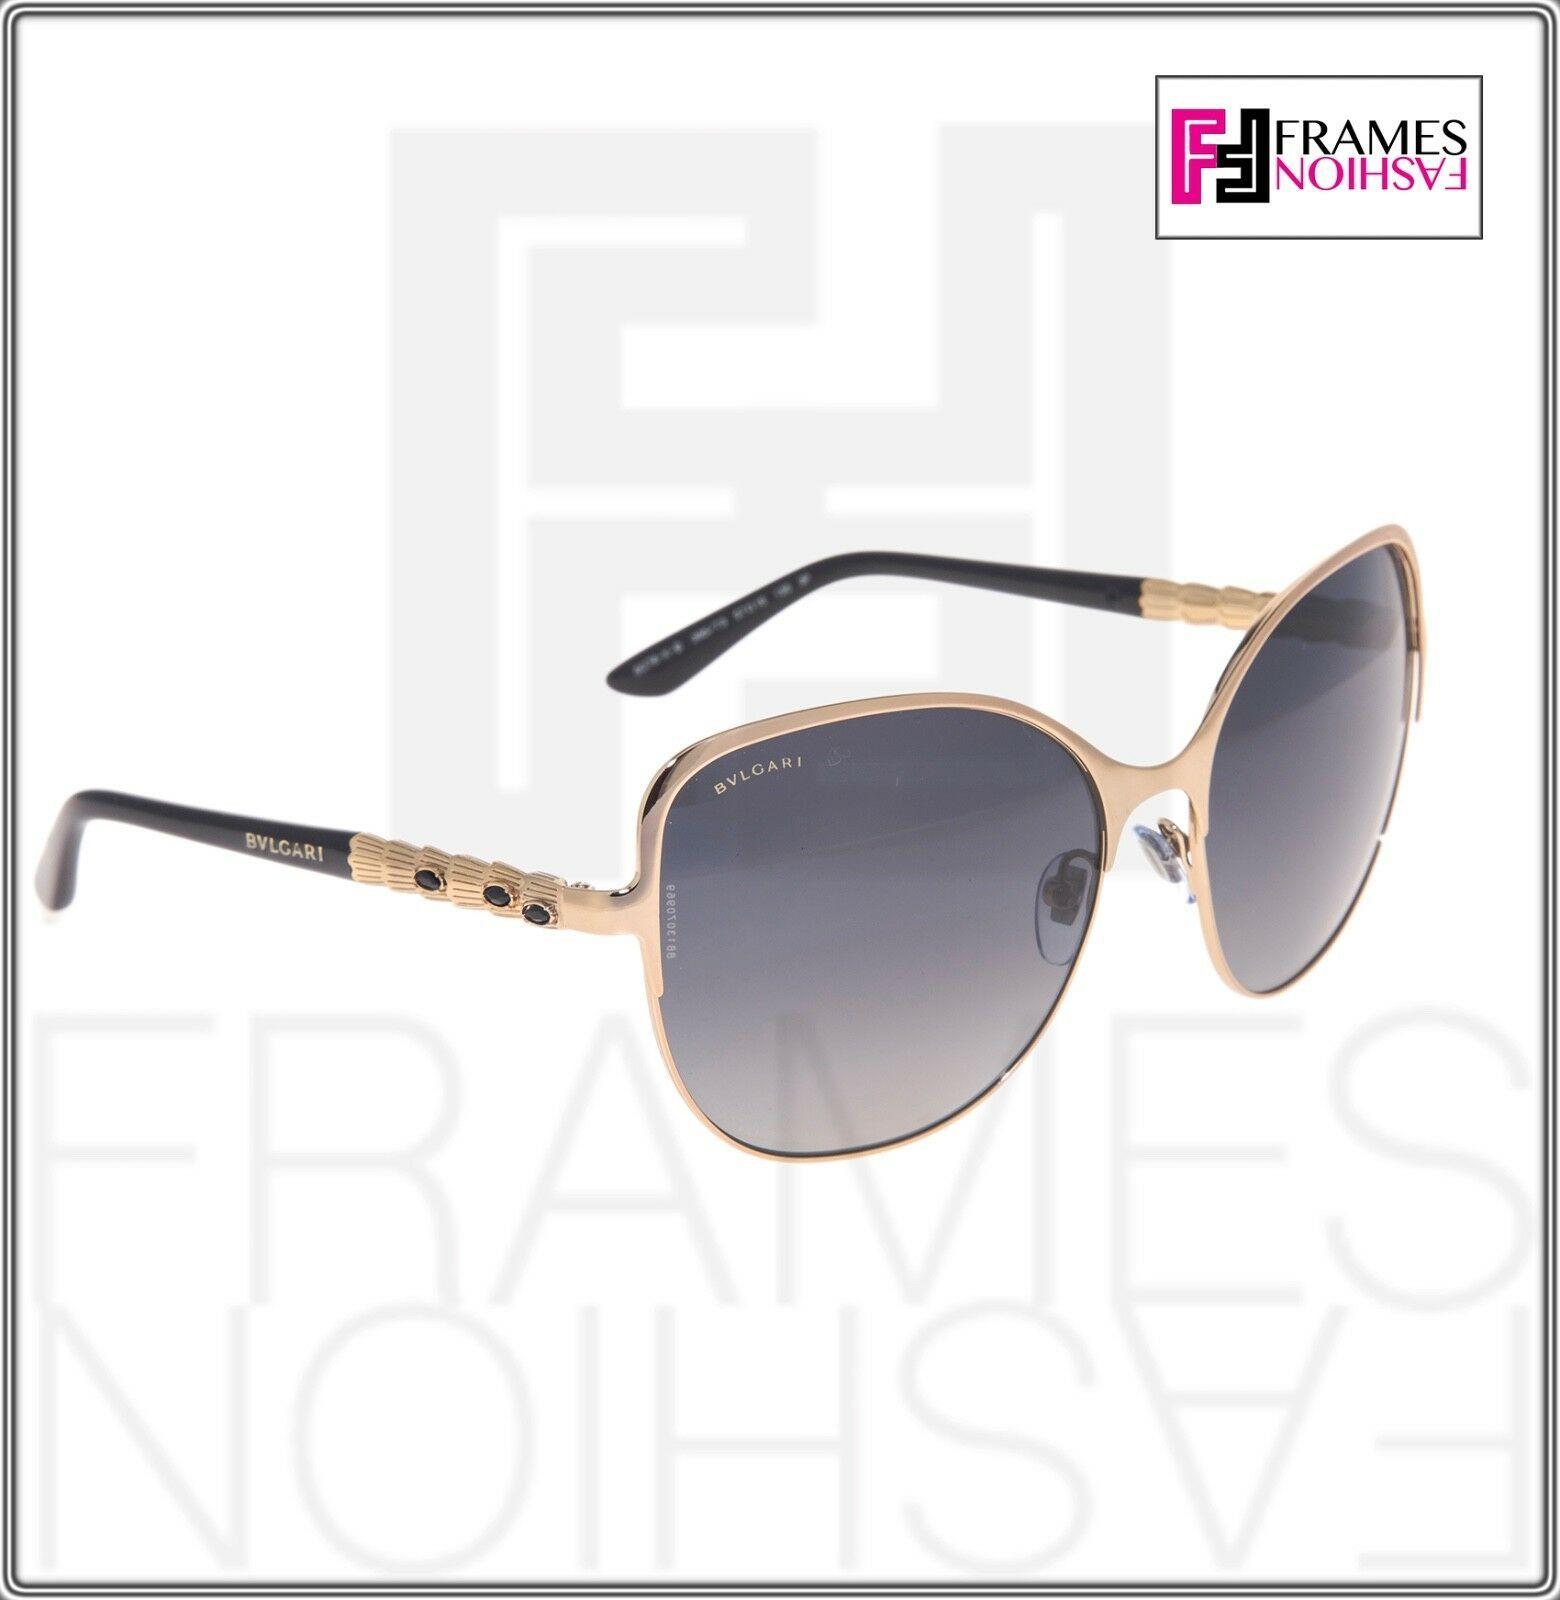 BVLGARI Le Gemme BV6078KB Black Gold 18K Plated POLARIZED Sunglasses 6078 Women image 5